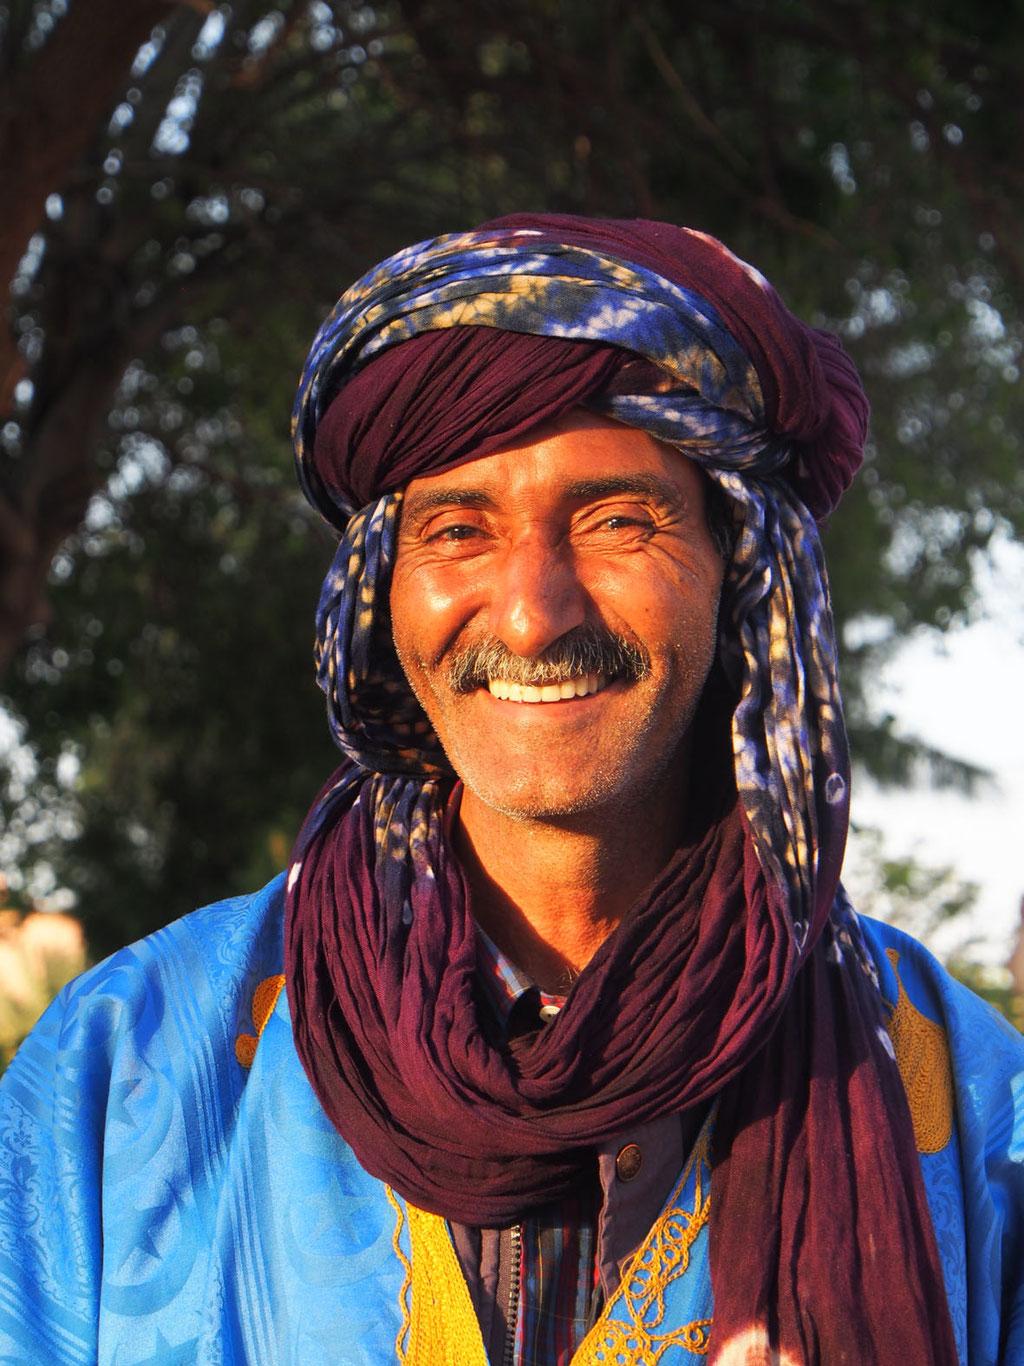 Marokko: Händler in Marrakesch